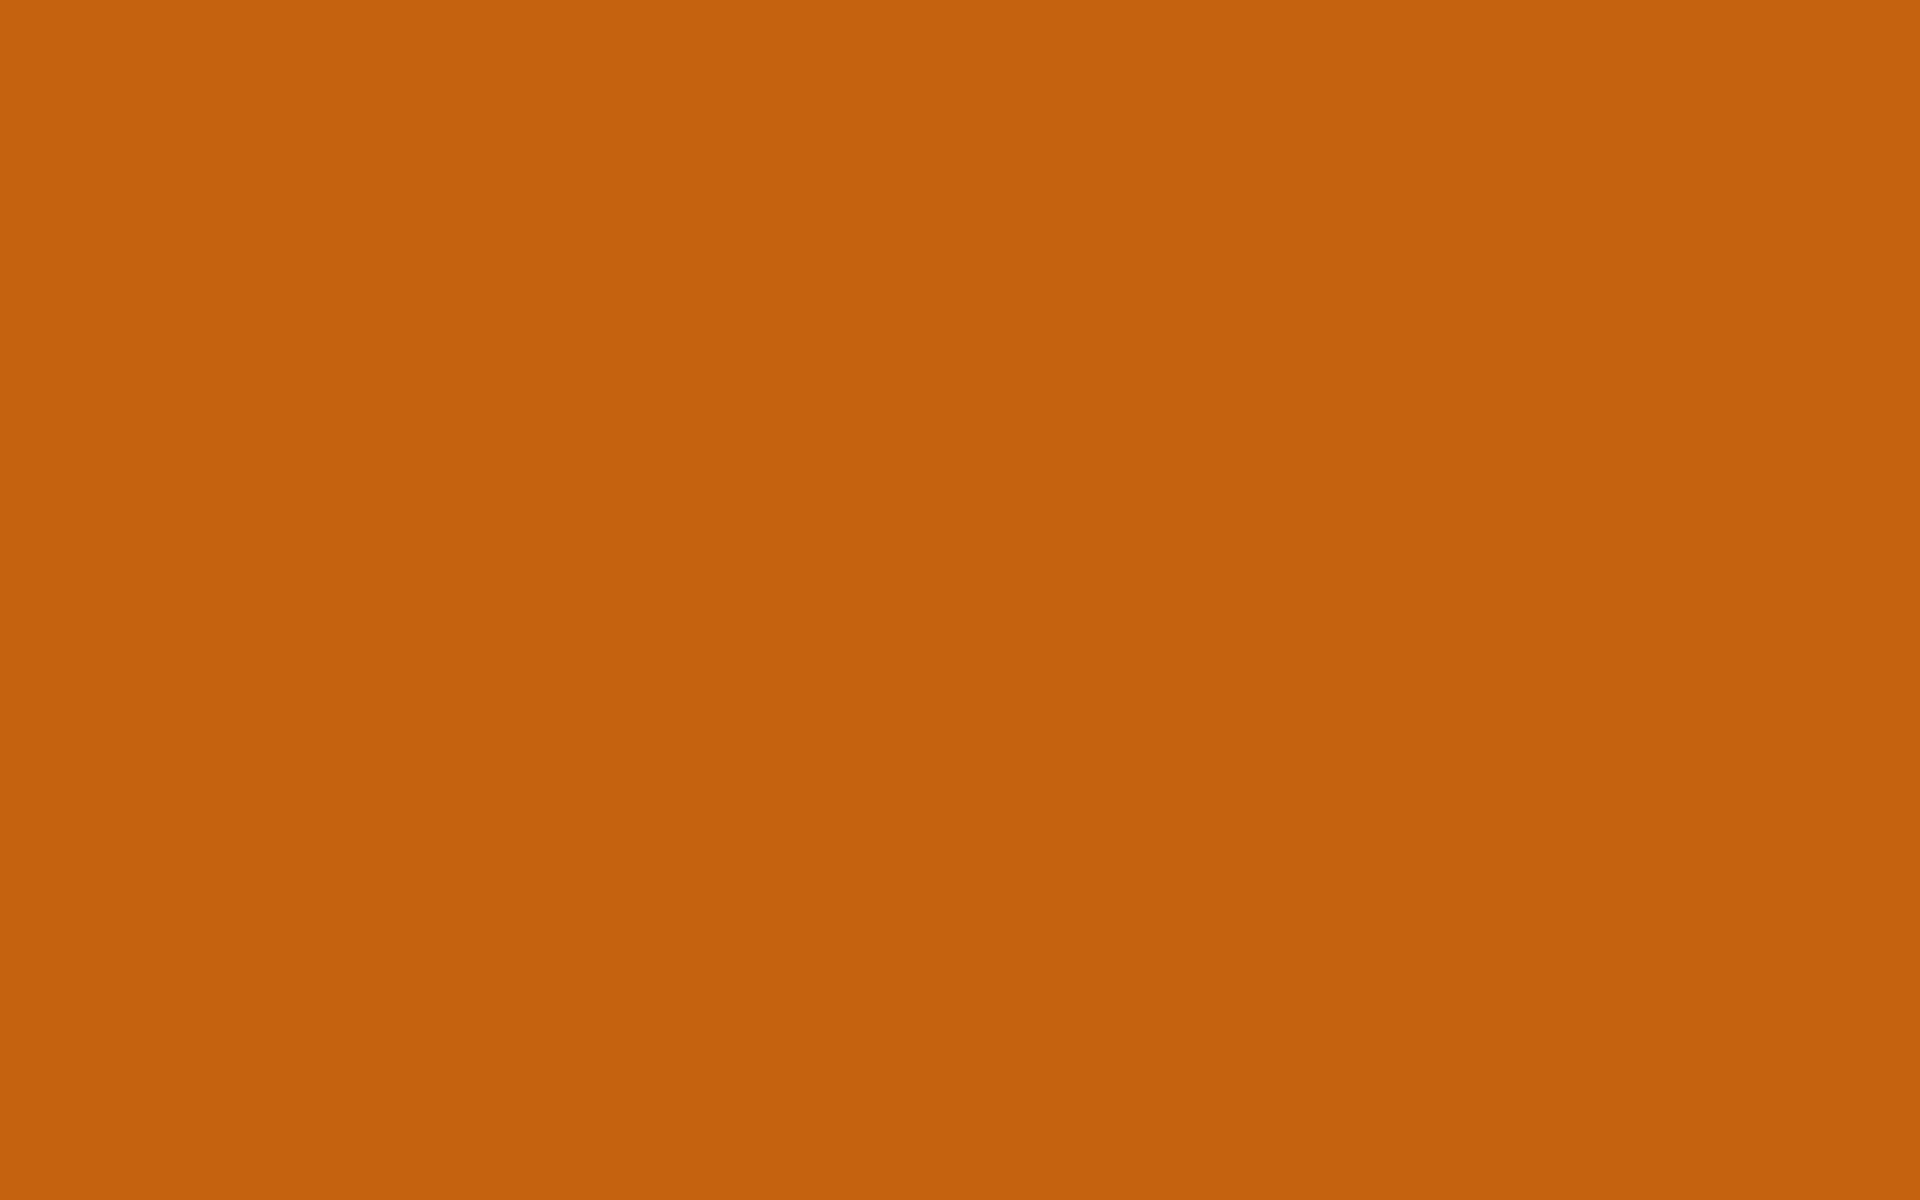 1920x1200 Alloy Orange Solid Color Background